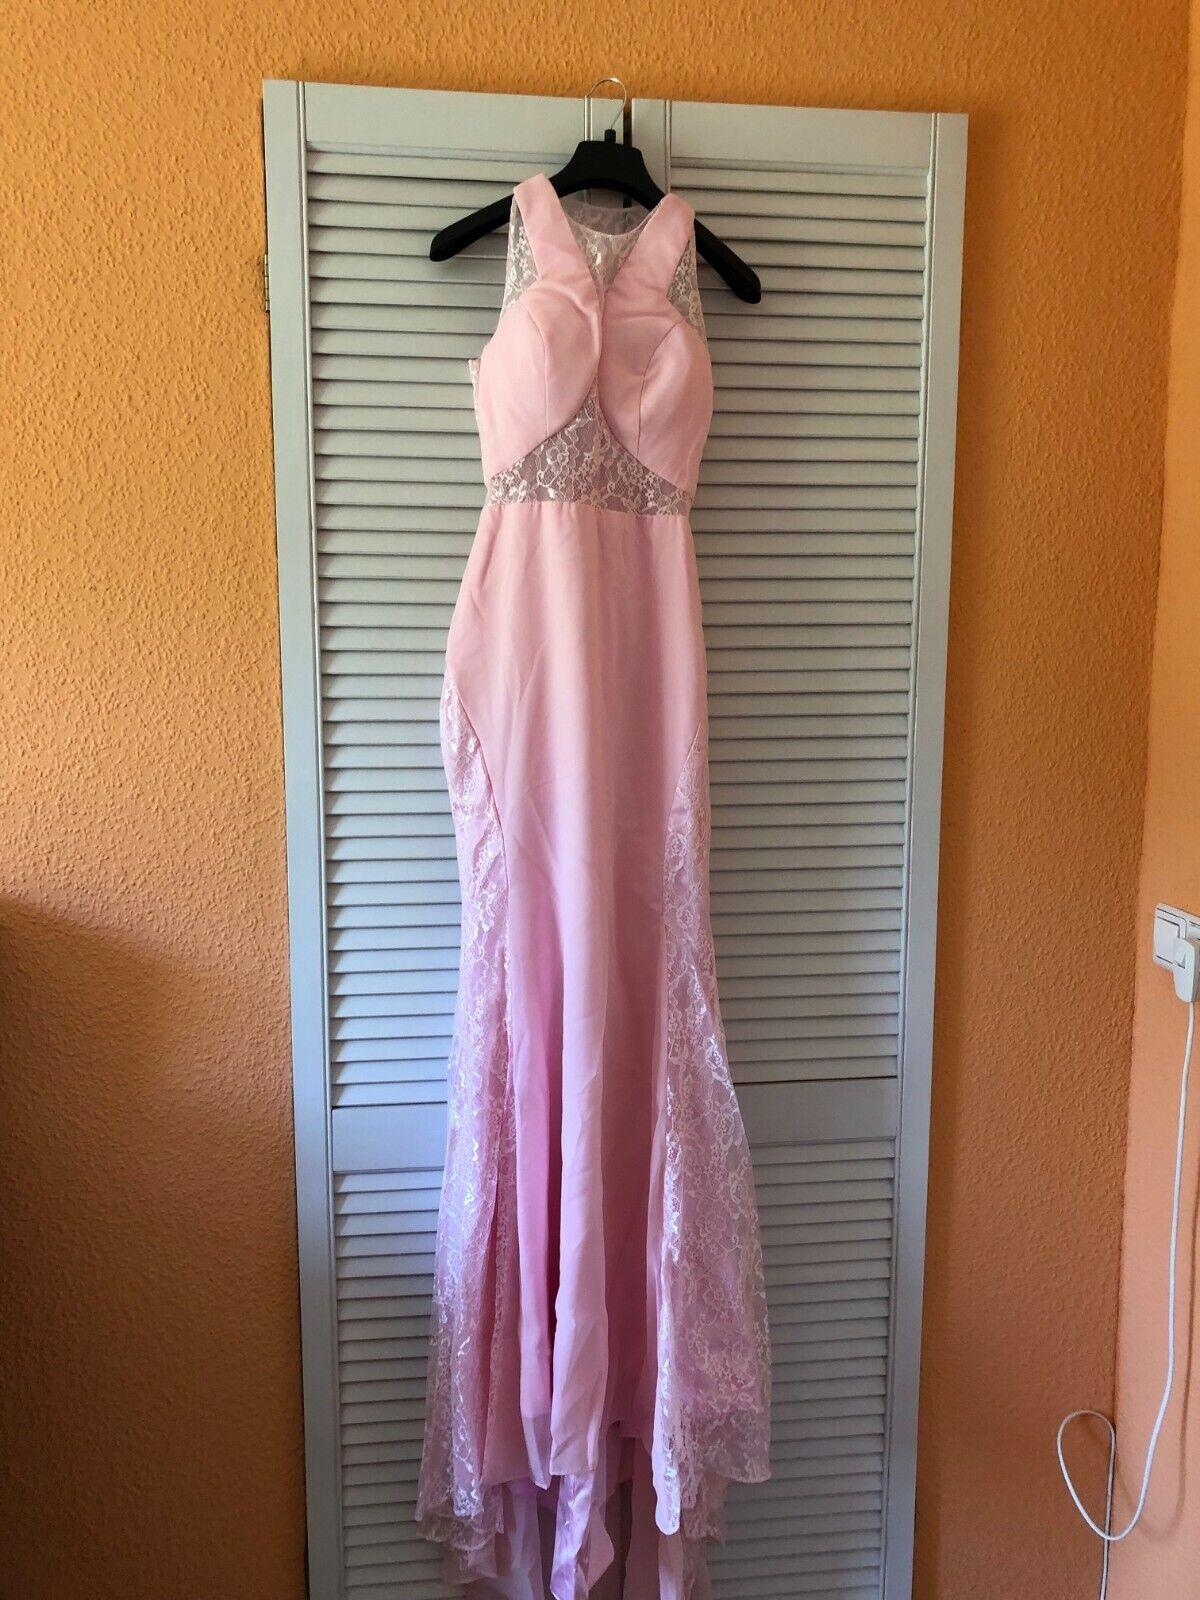 Jugendweihe- oder Abiballkleid Rosa, elegantes sehr schmales Kleid